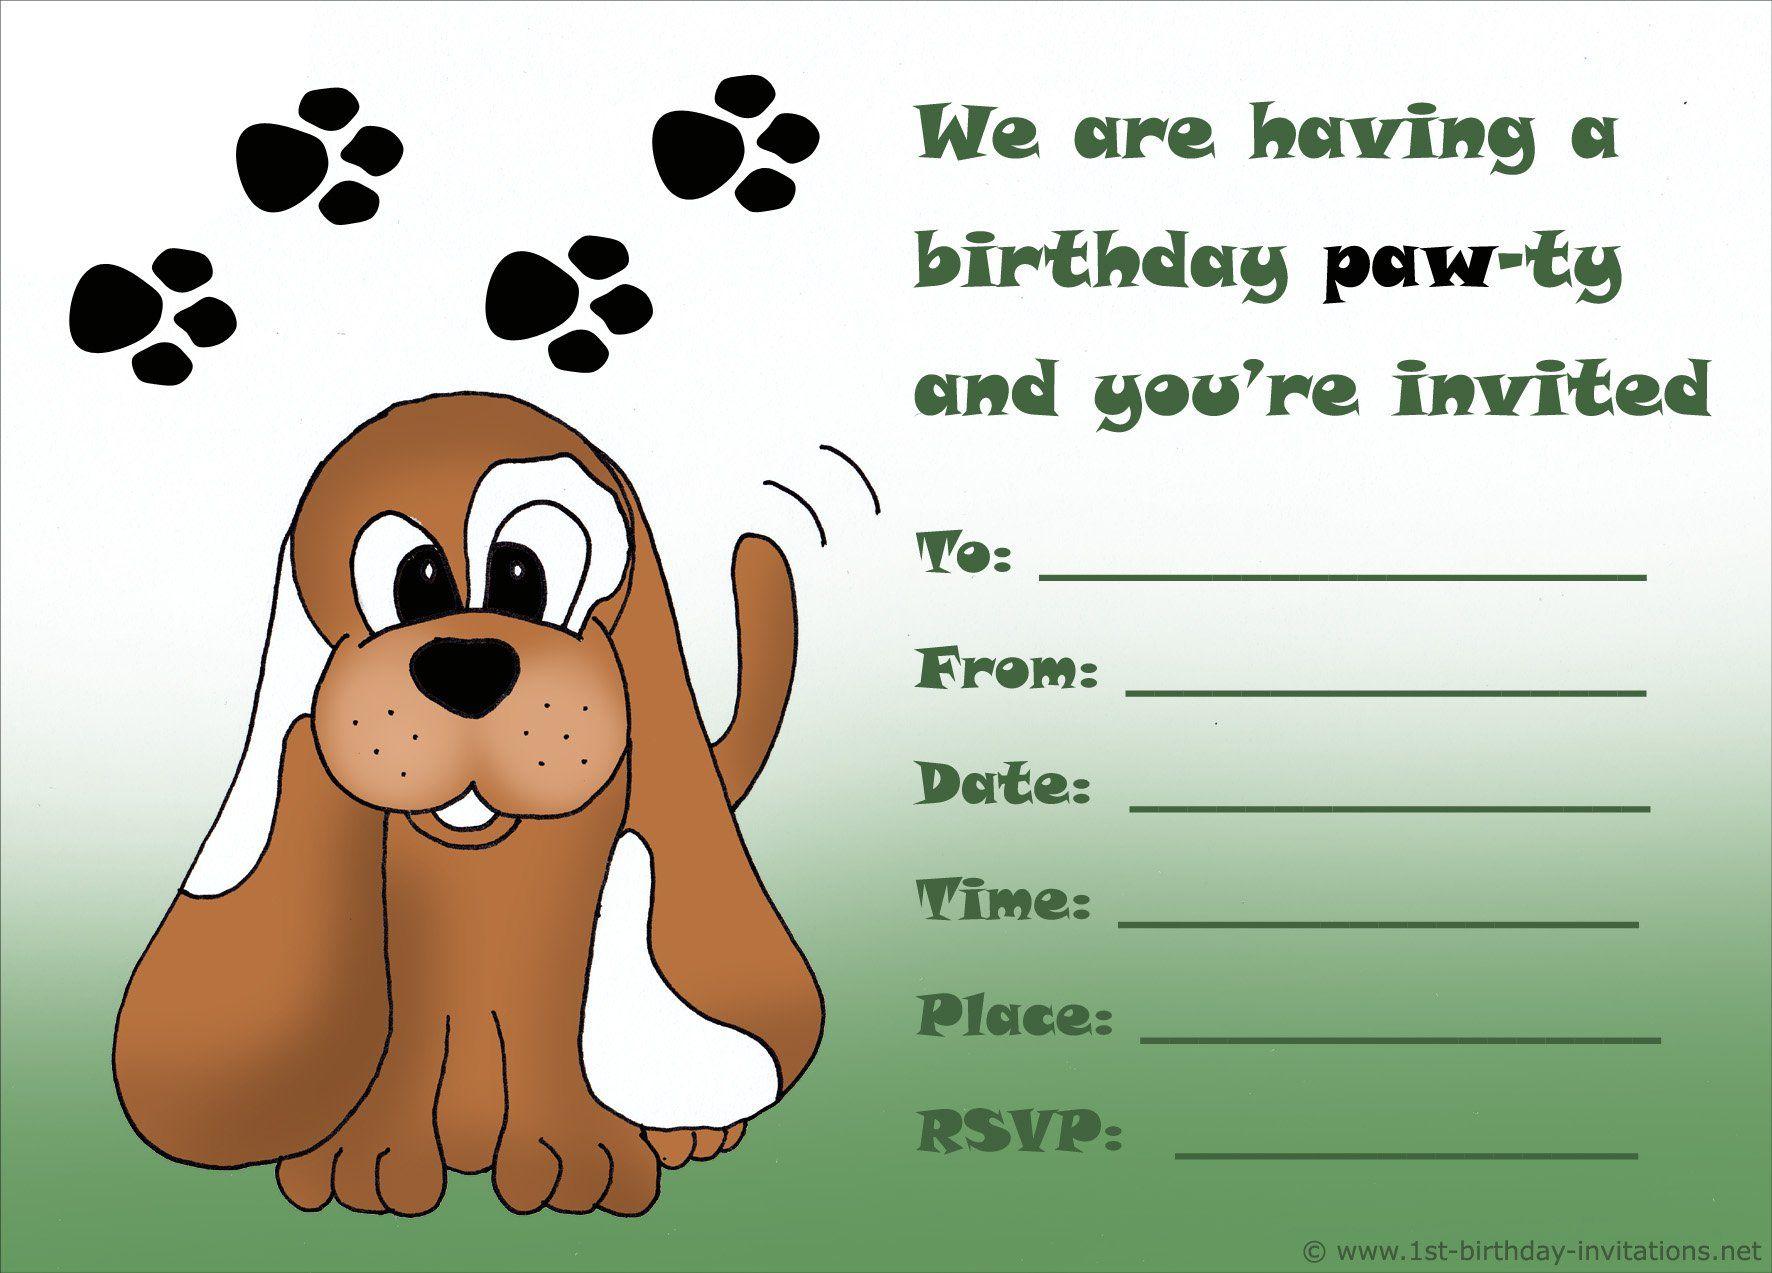 Boy-Birthday-Invitation-Cards-Free-Printable   Birthday Invitations - Free Printable Puppy Dog Birthday Invitations